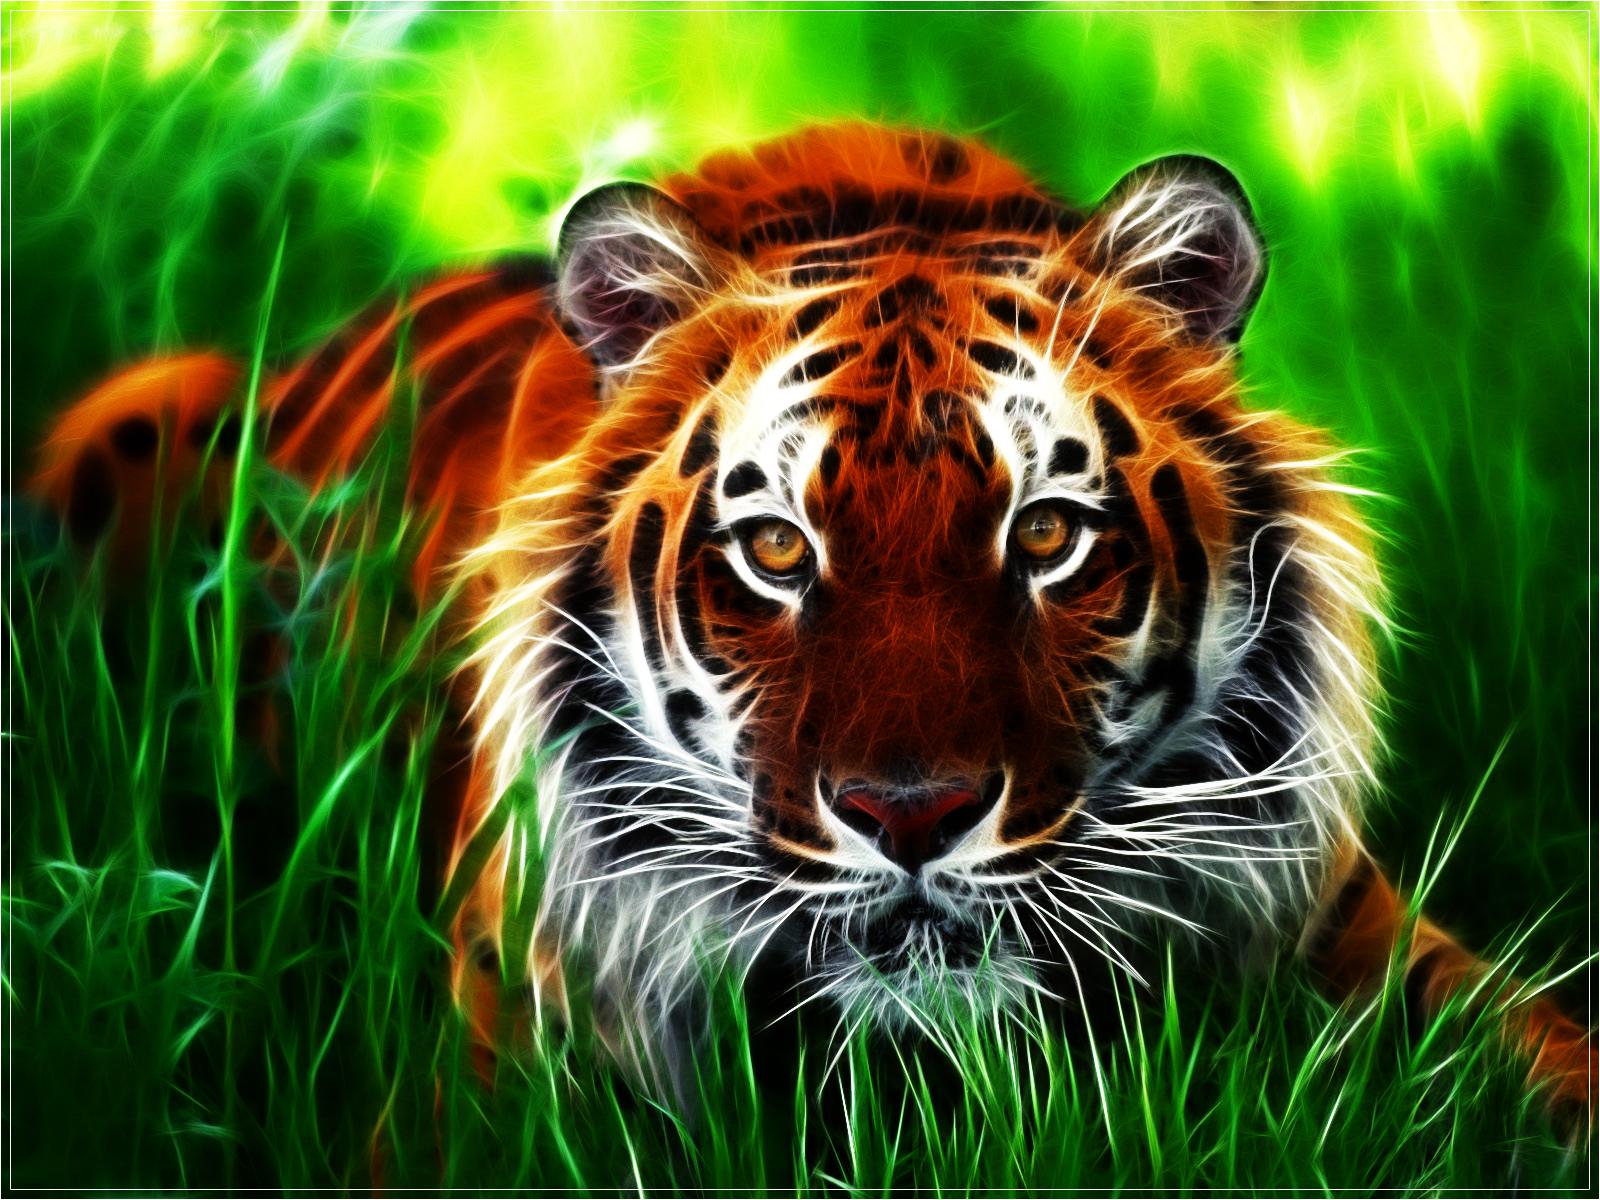 Animals Wallpapers  Free Download 720p HD Desktop Images